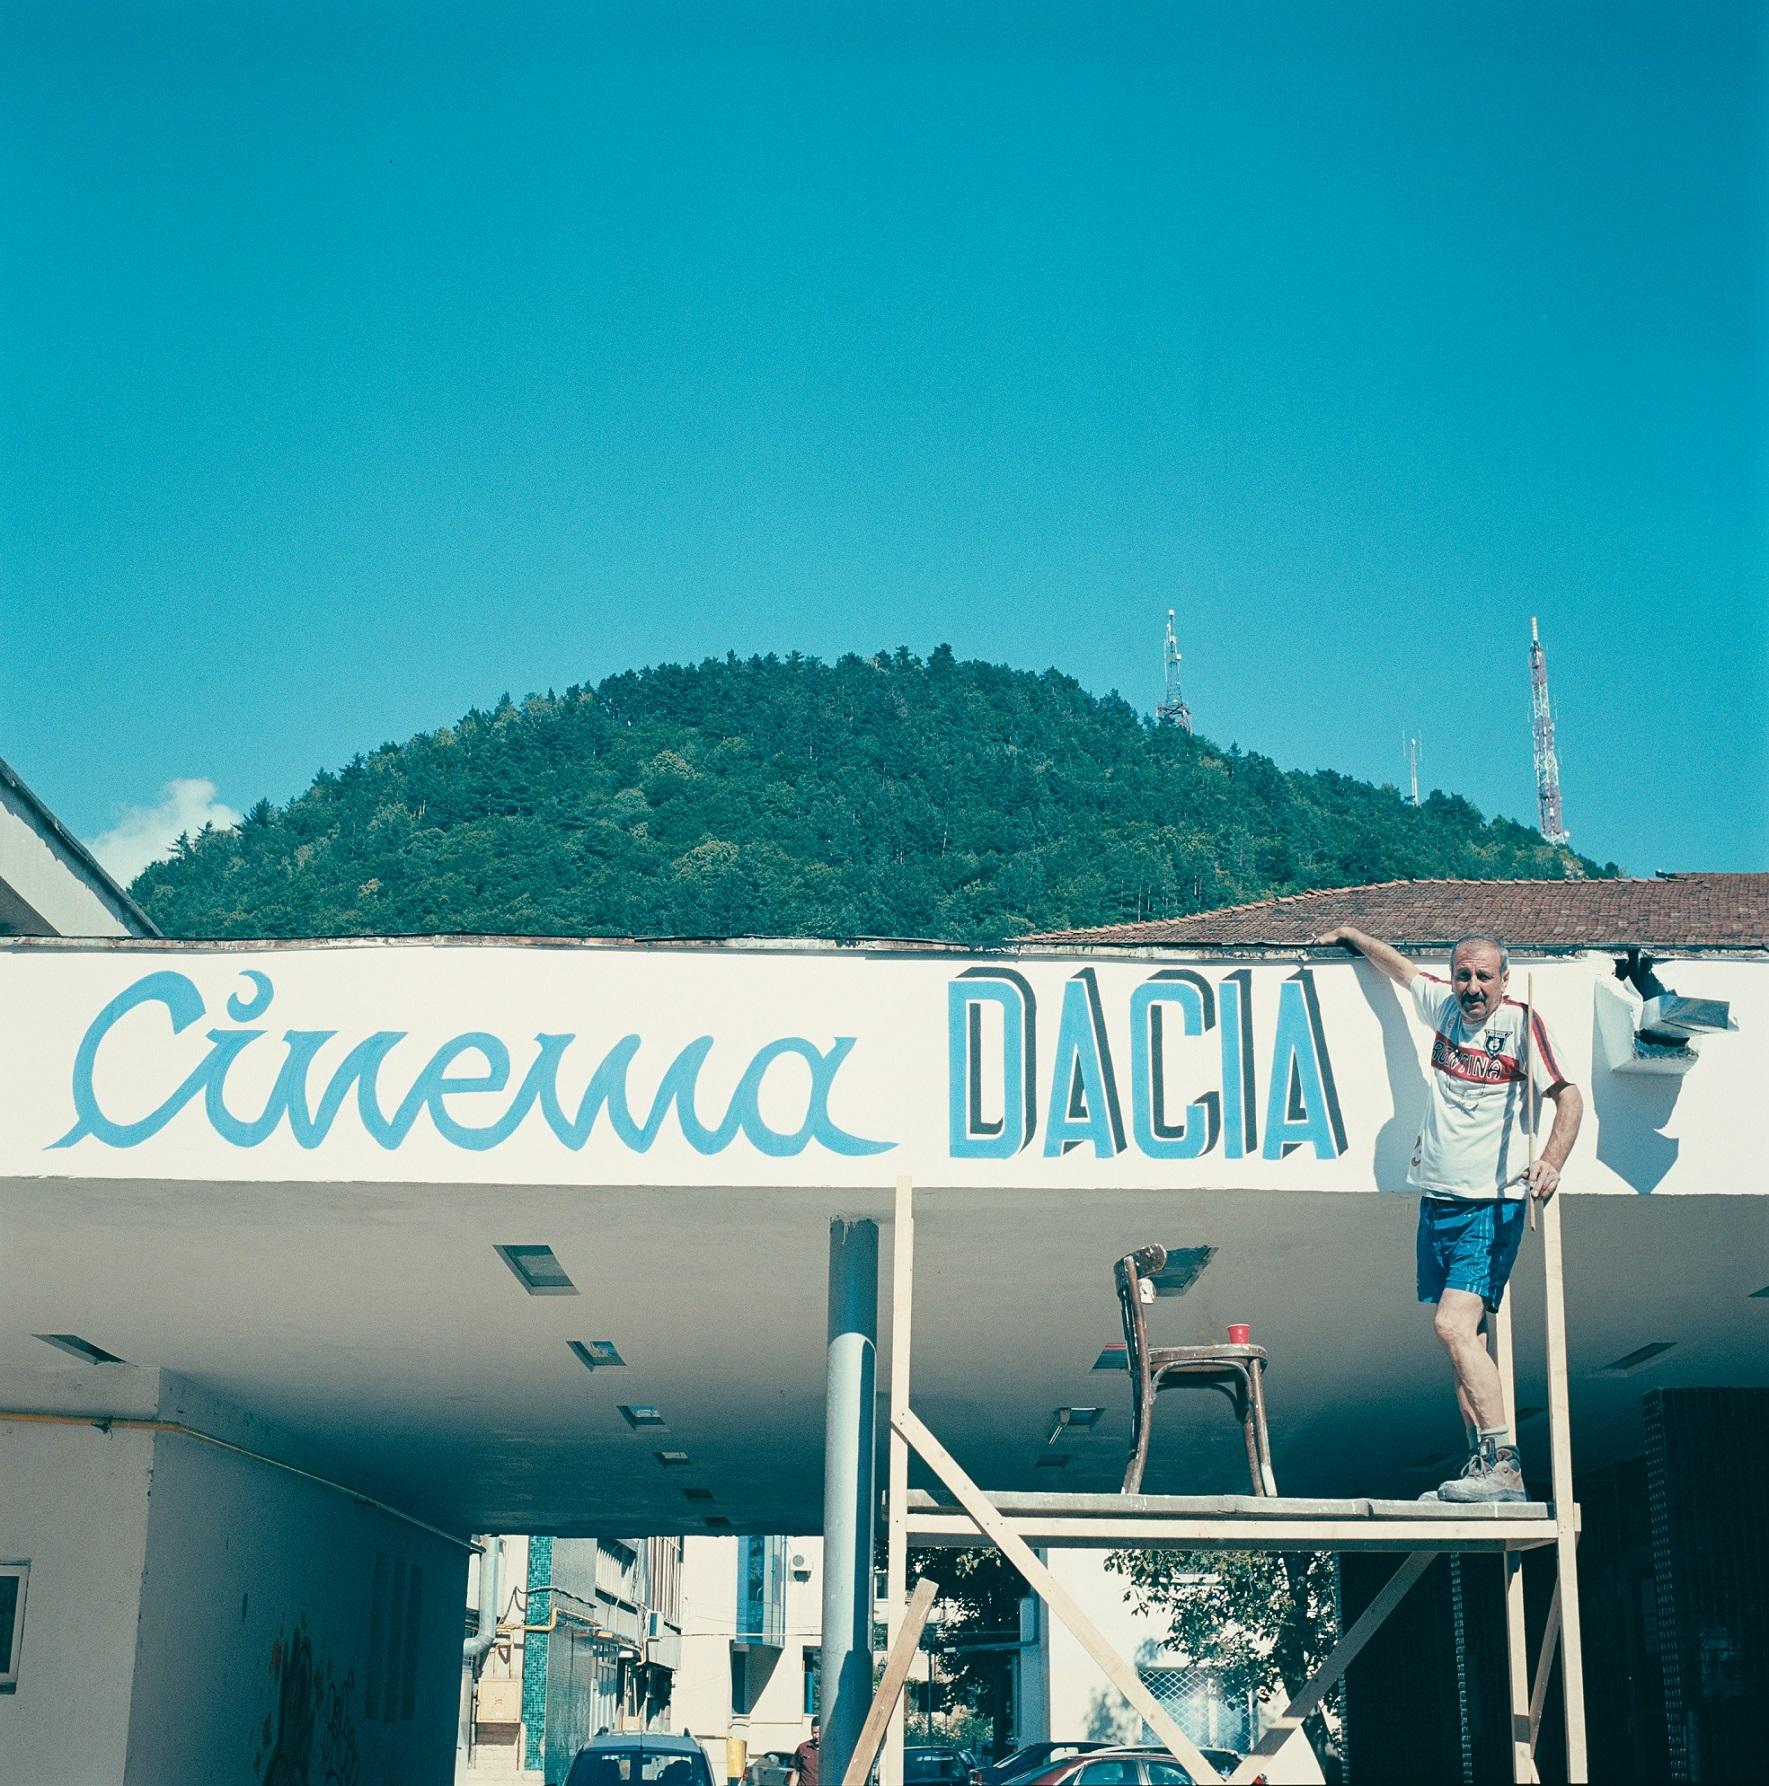 imagini cinema mon amour 2015 imagine 6 din 22 cinemagia ro